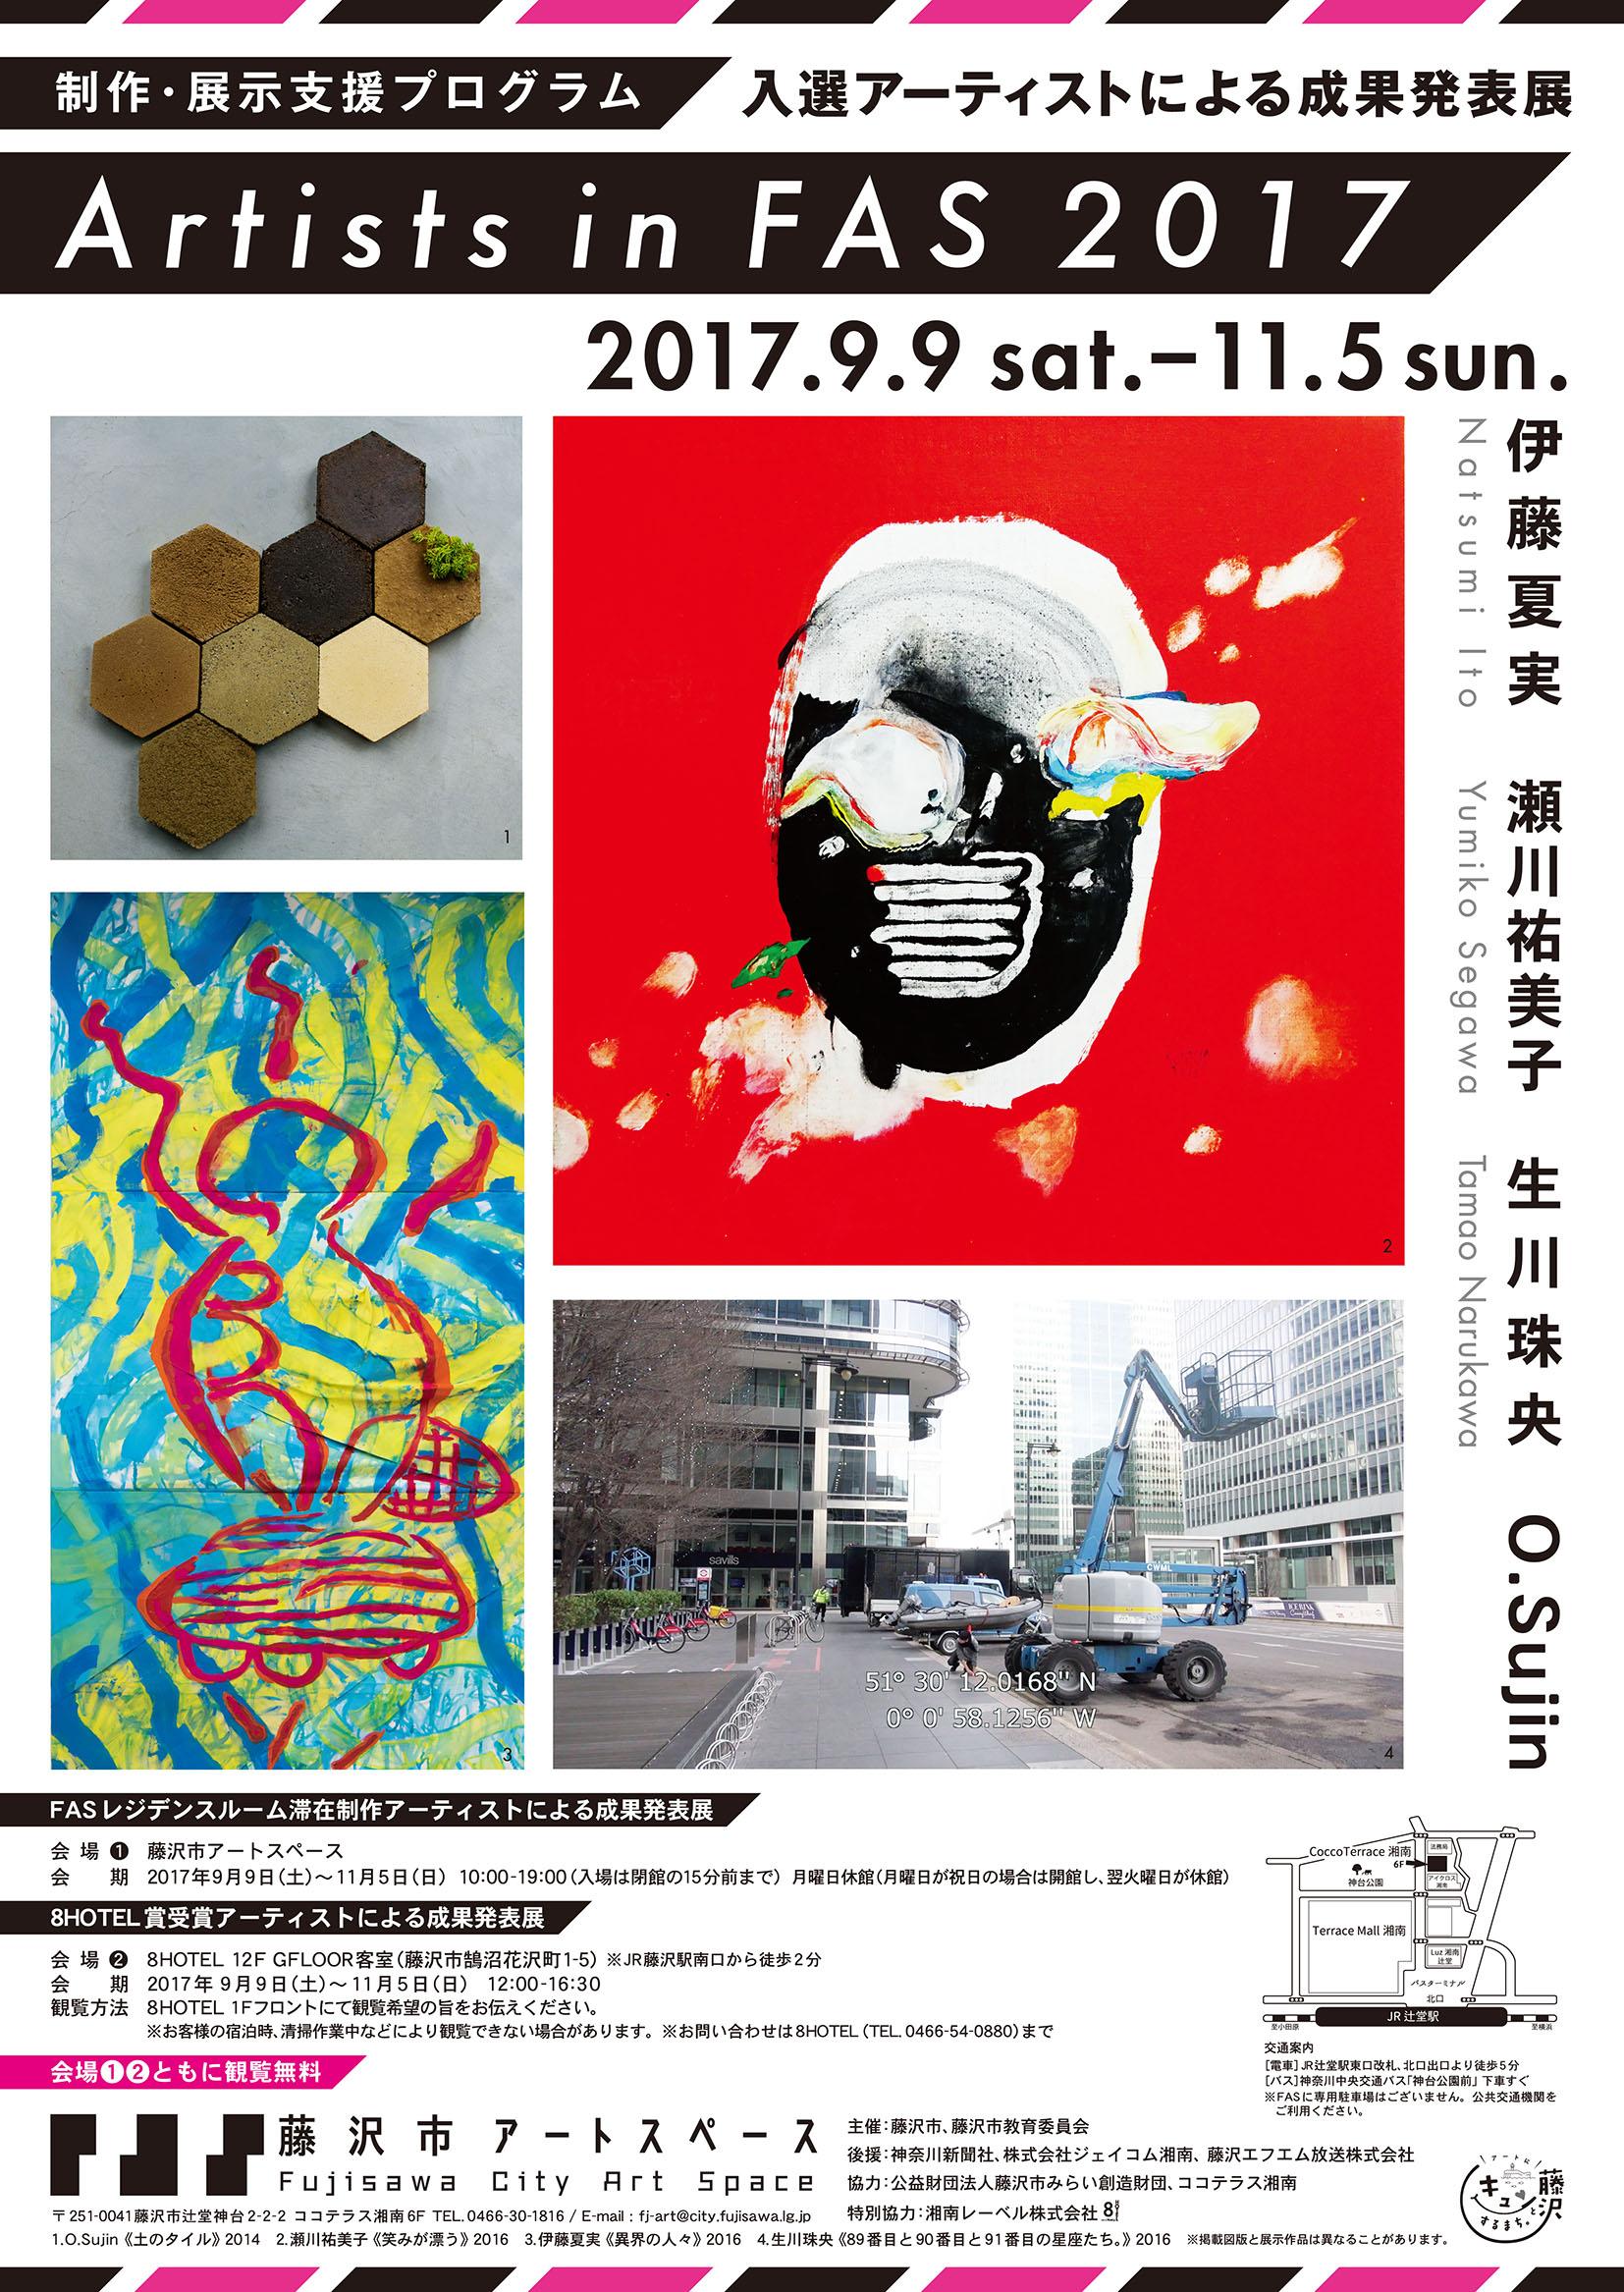 Artists in FAS 2017 入選アーティストによる成果発表展